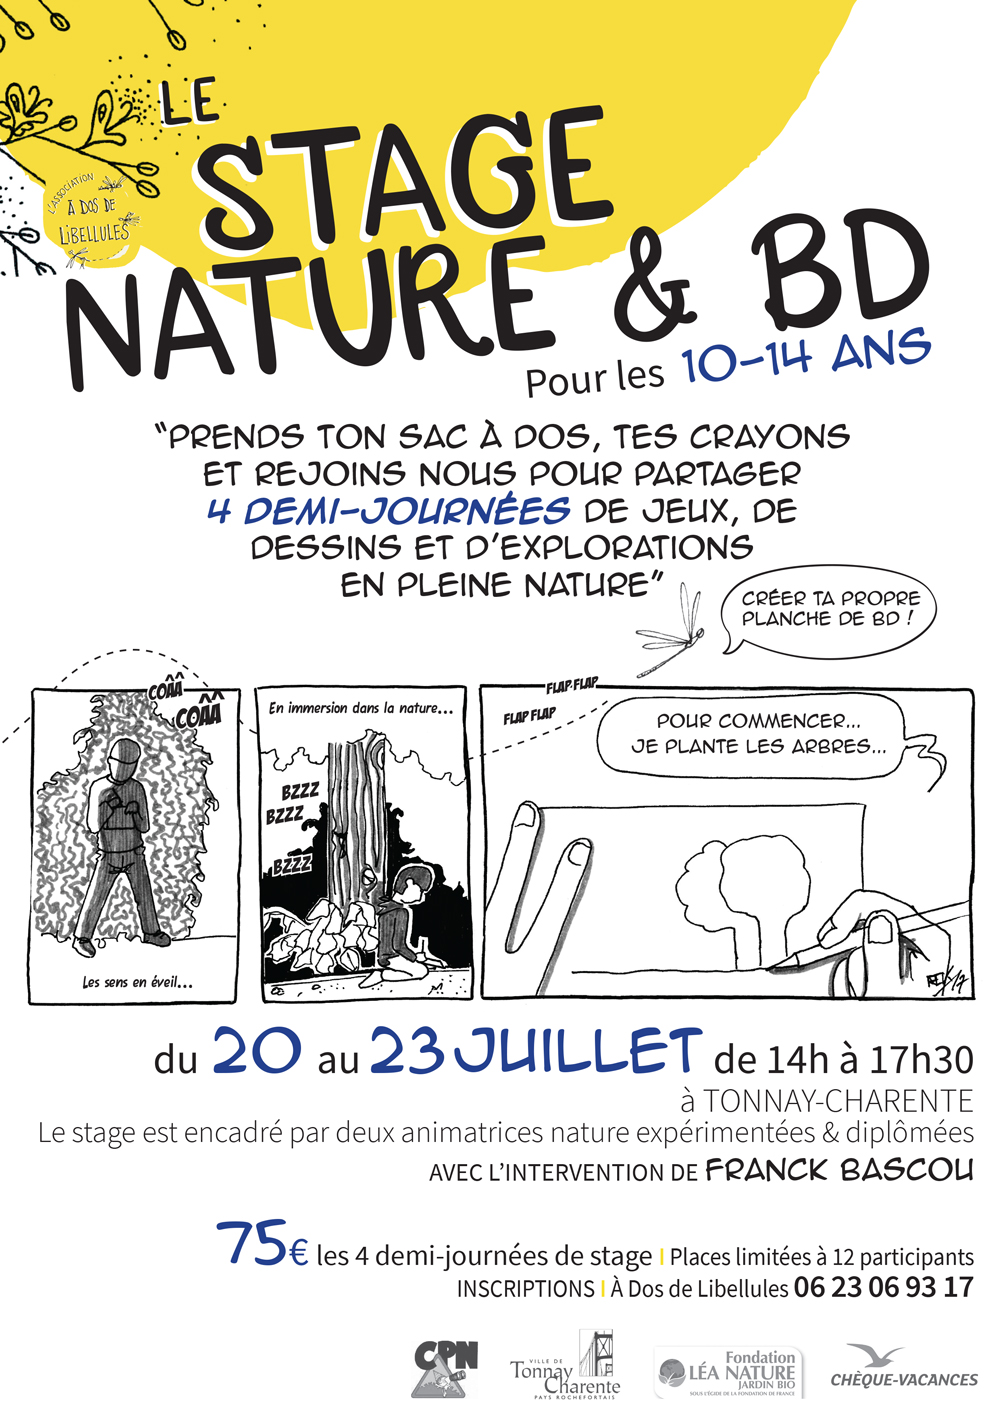 stage-nature-BD-juillet-2021 (2).jpg